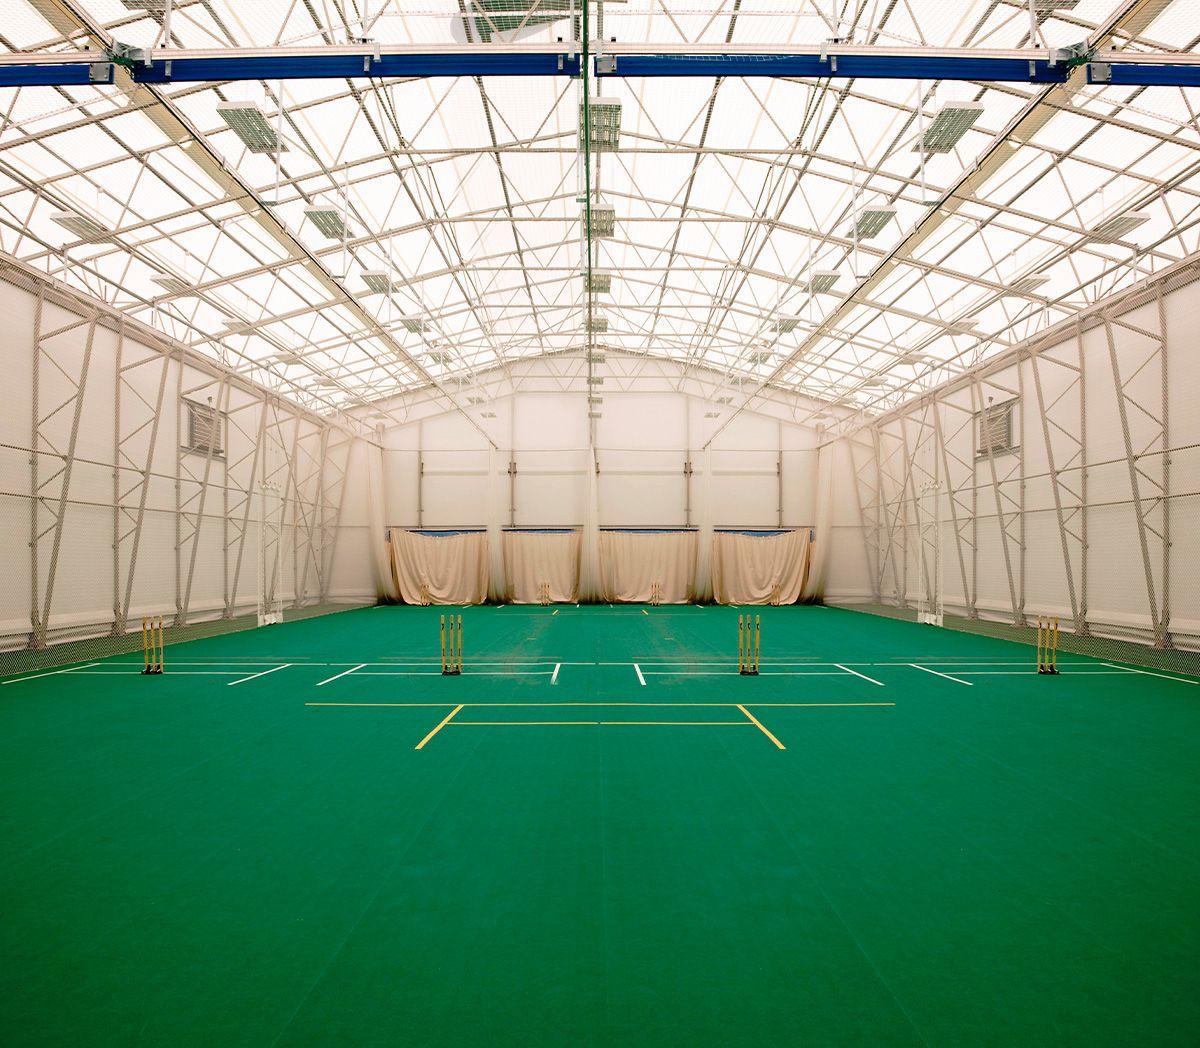 Eversley Cricket Club